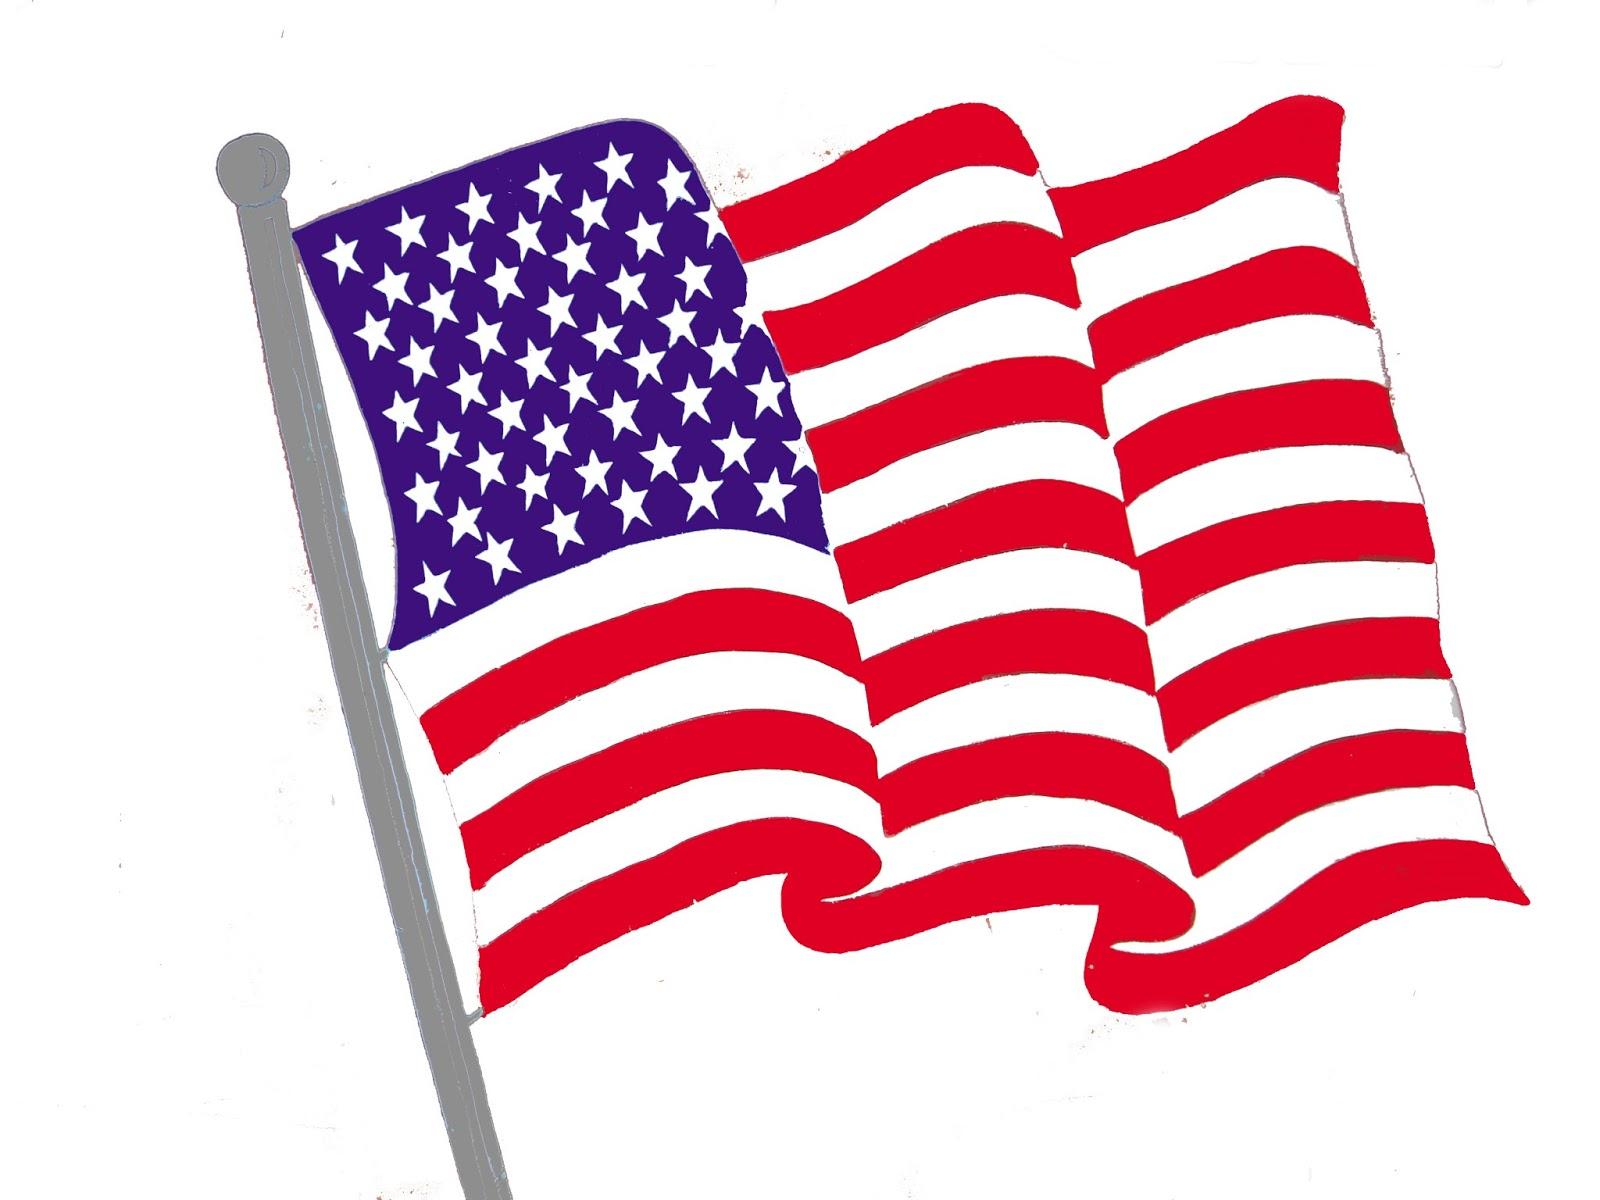 1600x1200 American Flag Free American Patriotic Clipart